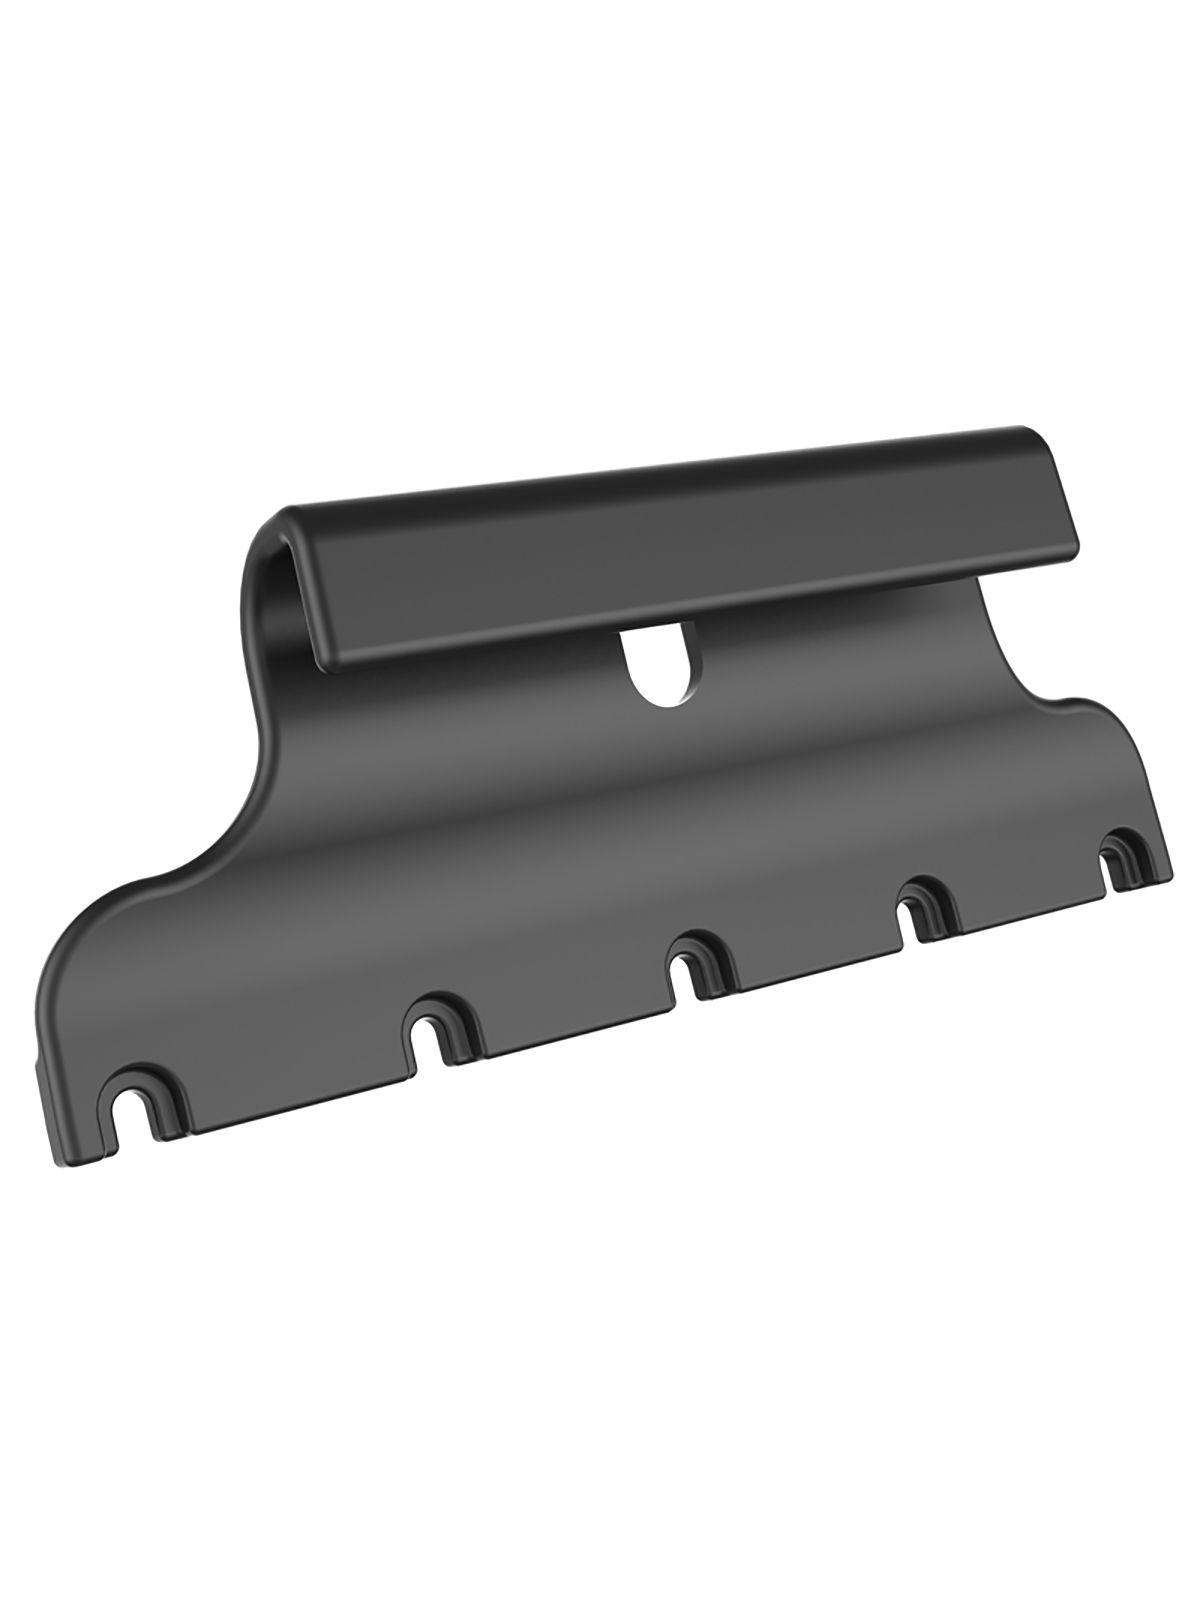 RAM Mounts Endkappe (oben) für GDS Dockingstation Apple iPad mini 4 / 5